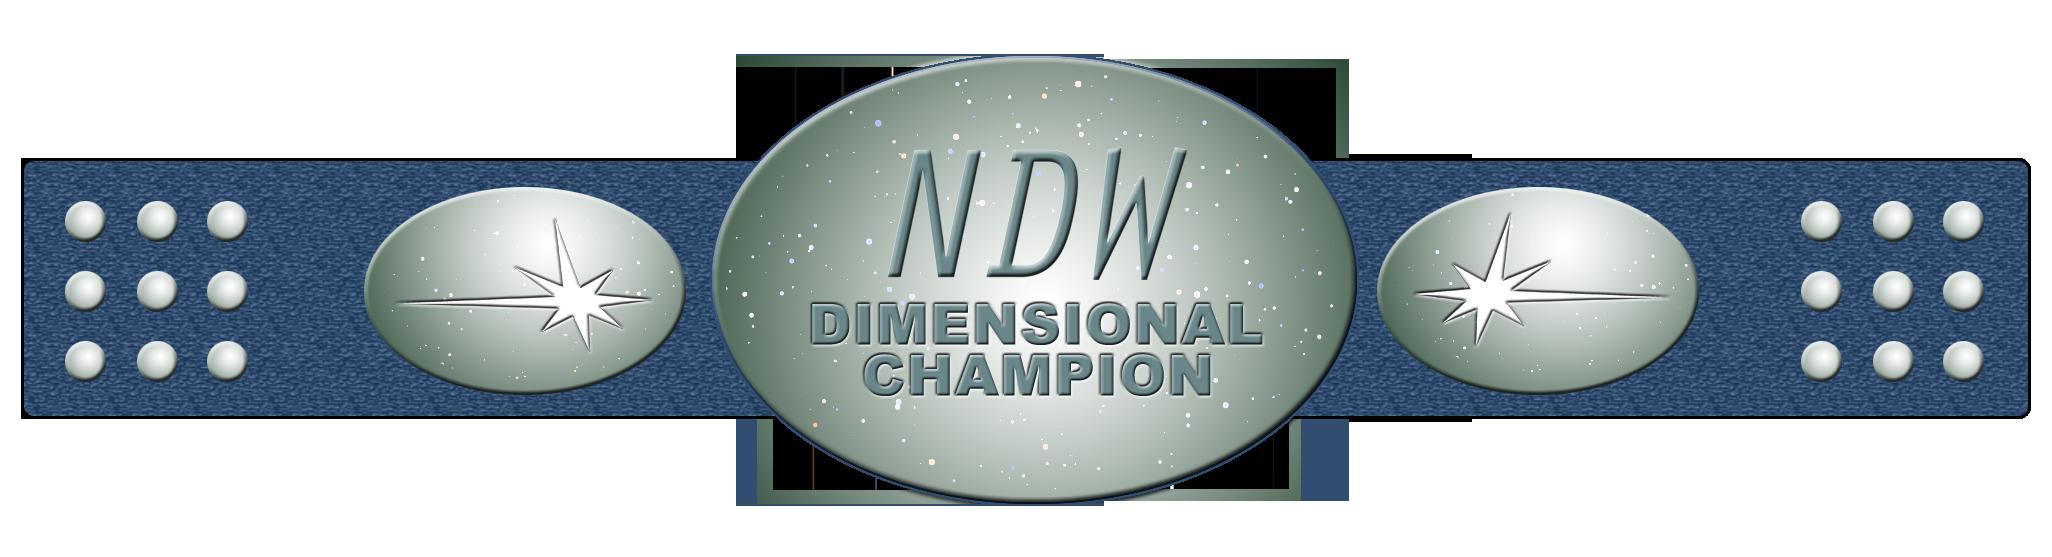 NDW Dimensional Champion